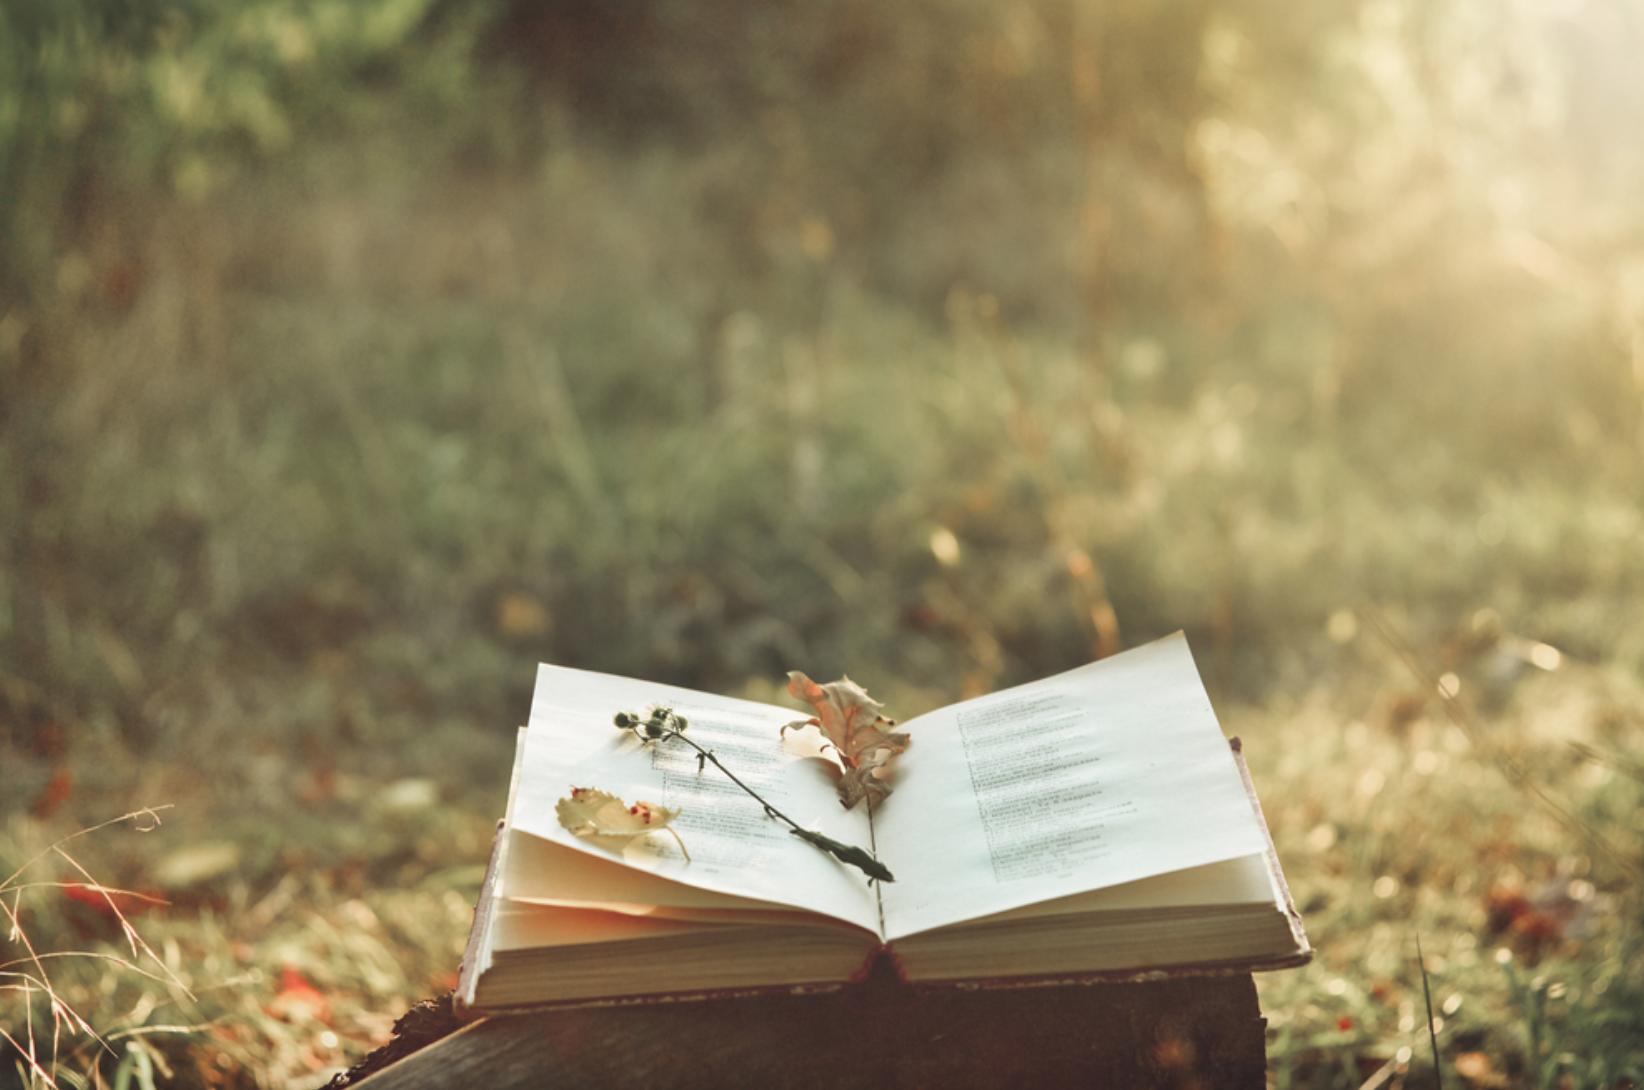 Entrepreneur & Poet Michael Andrew Lauchlan Reveals His 5 Favorite Poetry Books Of All-Time